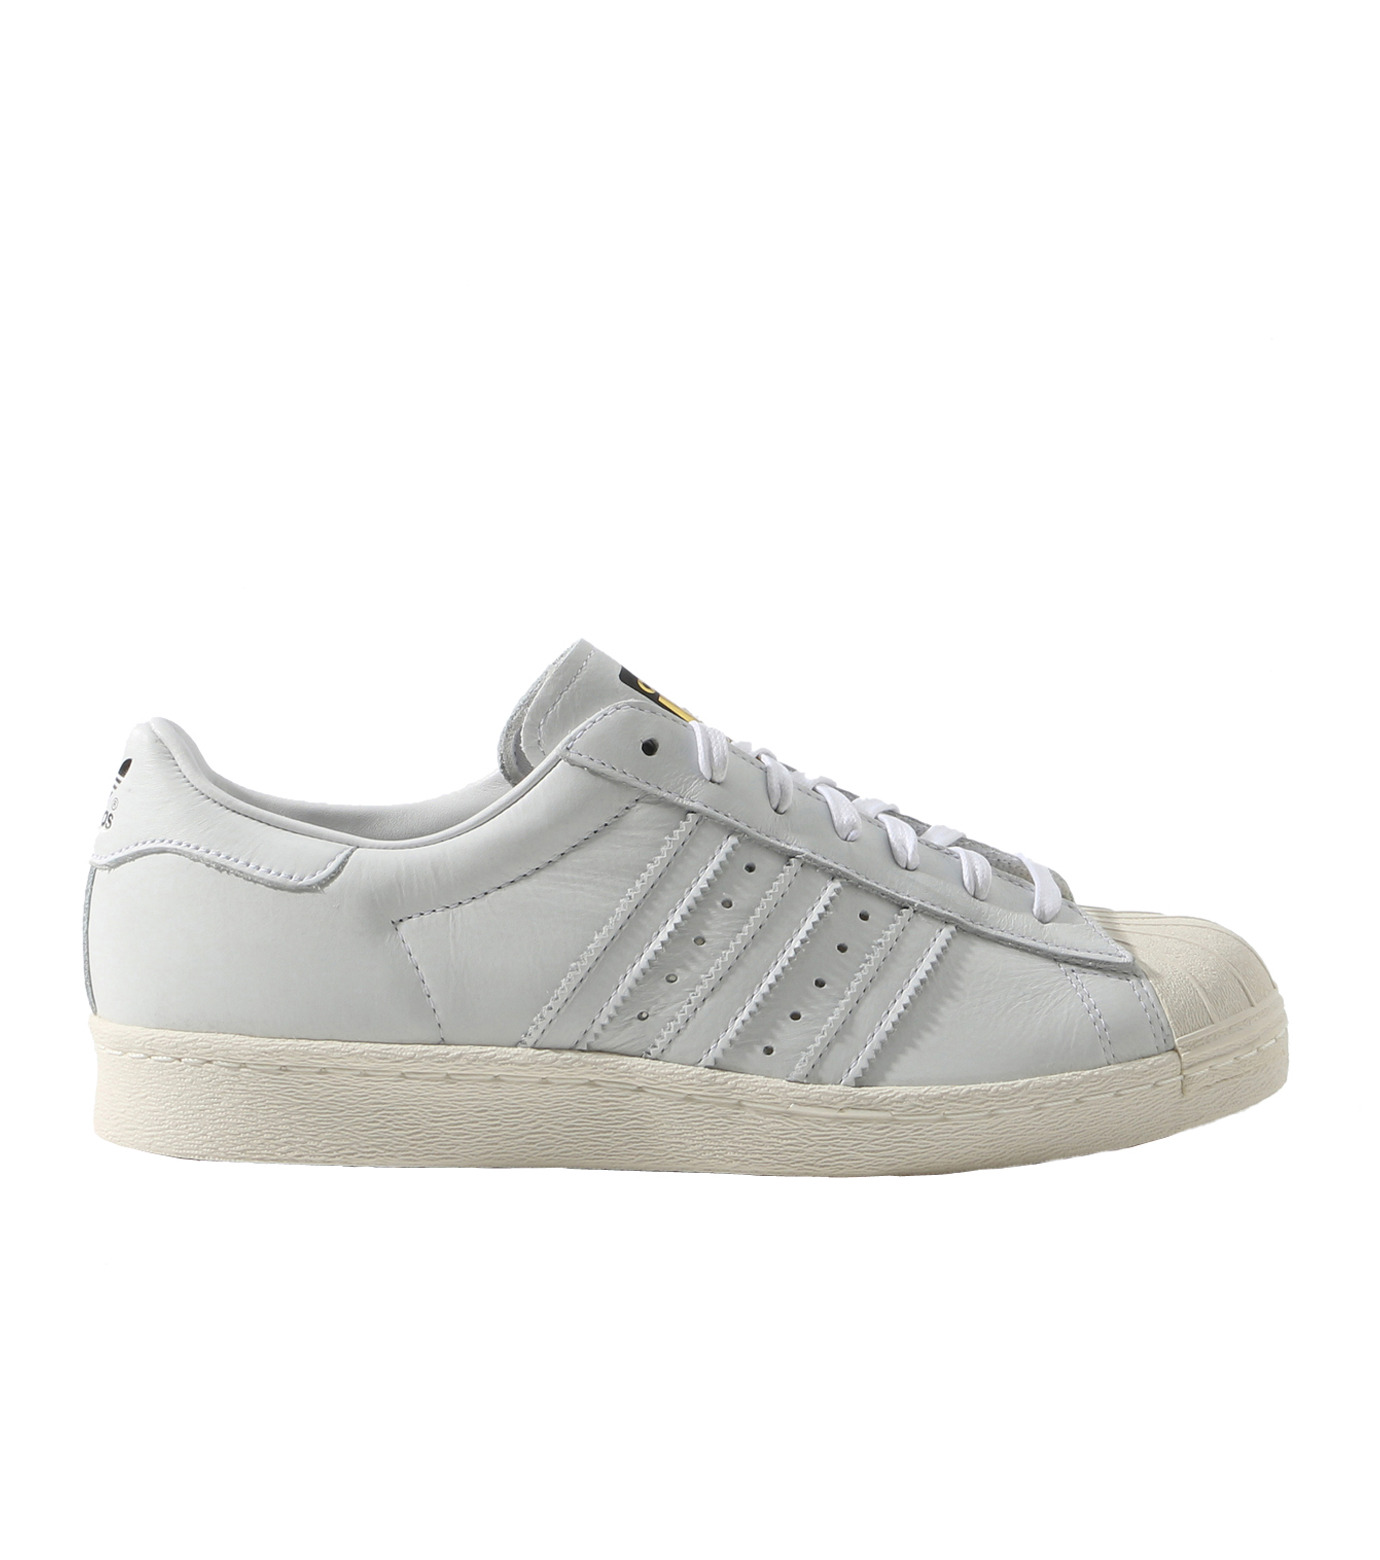 adidas(アディダス)のSUPERSTAR 80s DLX-WHITE(シューズ/shoes)-S75016-4 拡大詳細画像1